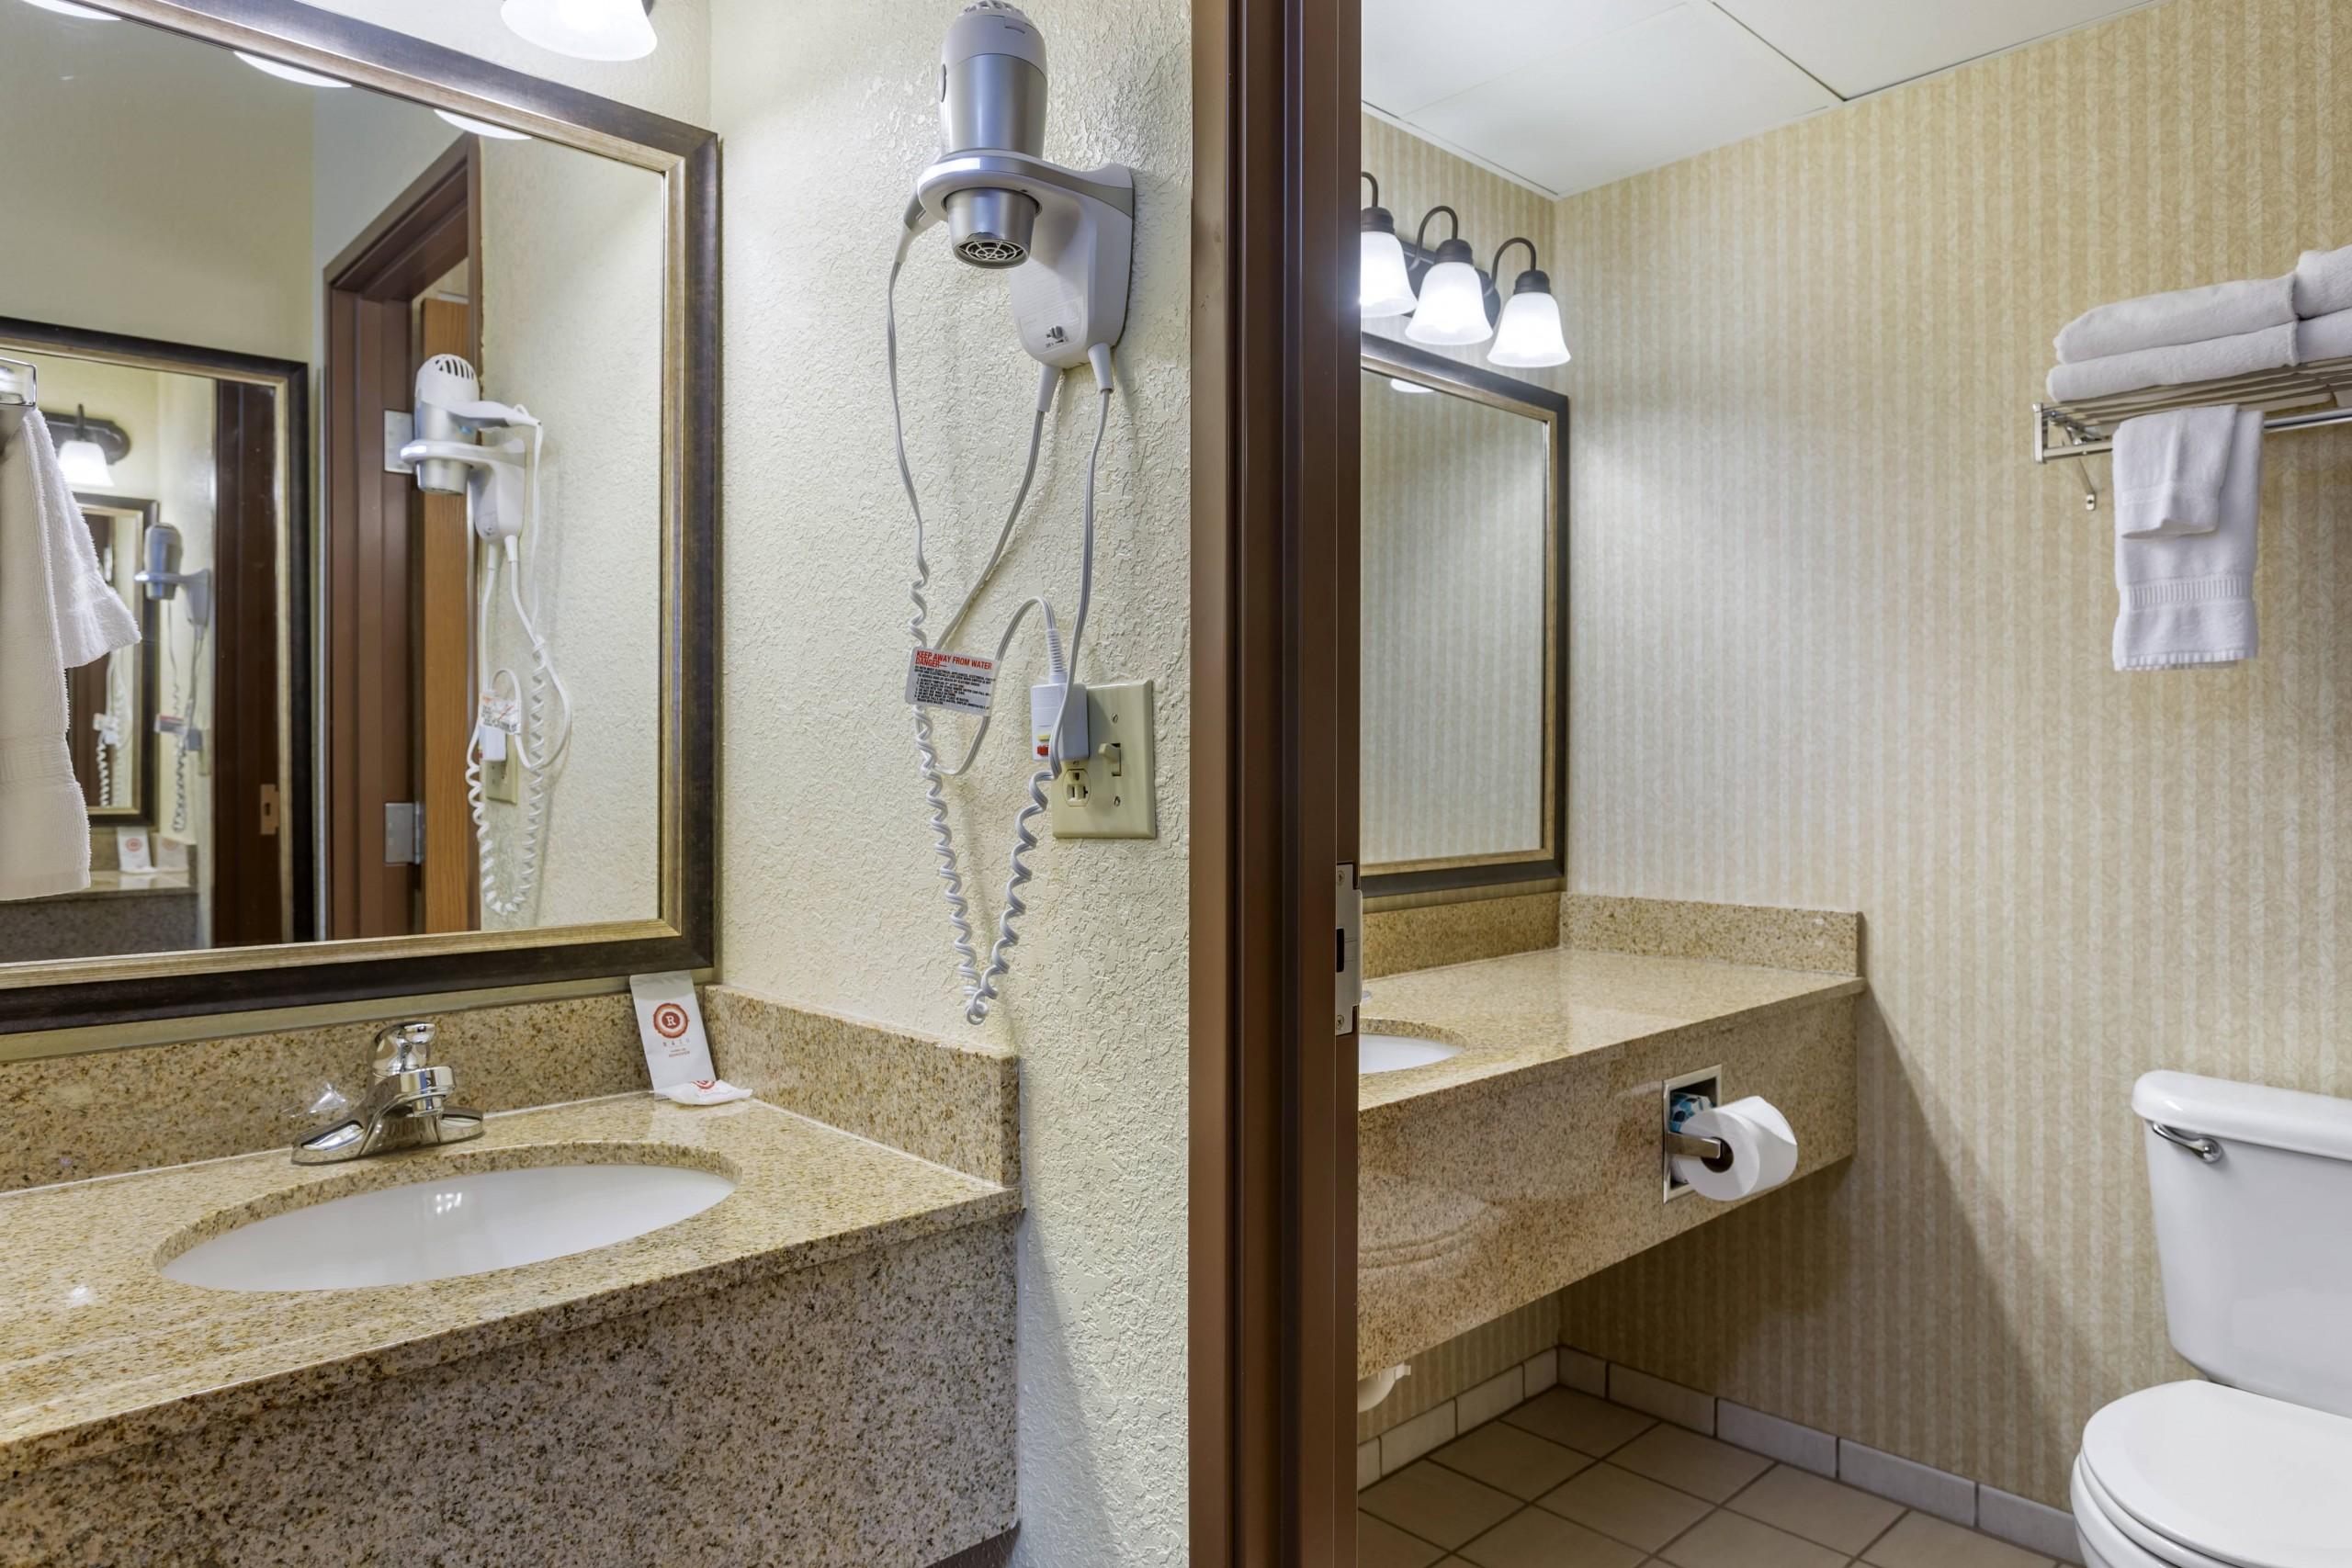 Branson Mo Comfort inn and suites Bathrooms